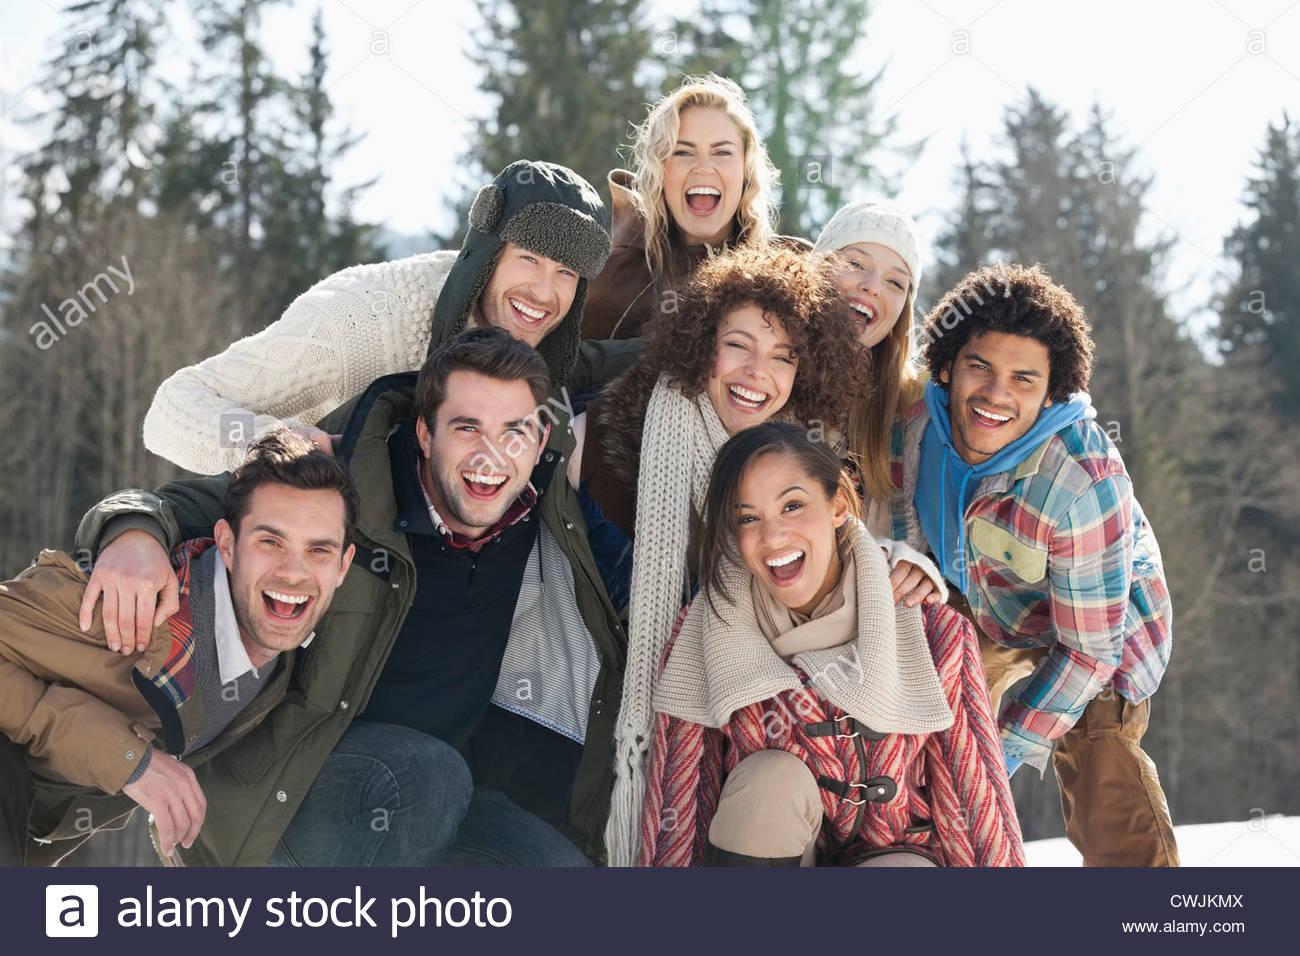 Portrait of enthusiastic friends Photo Stock